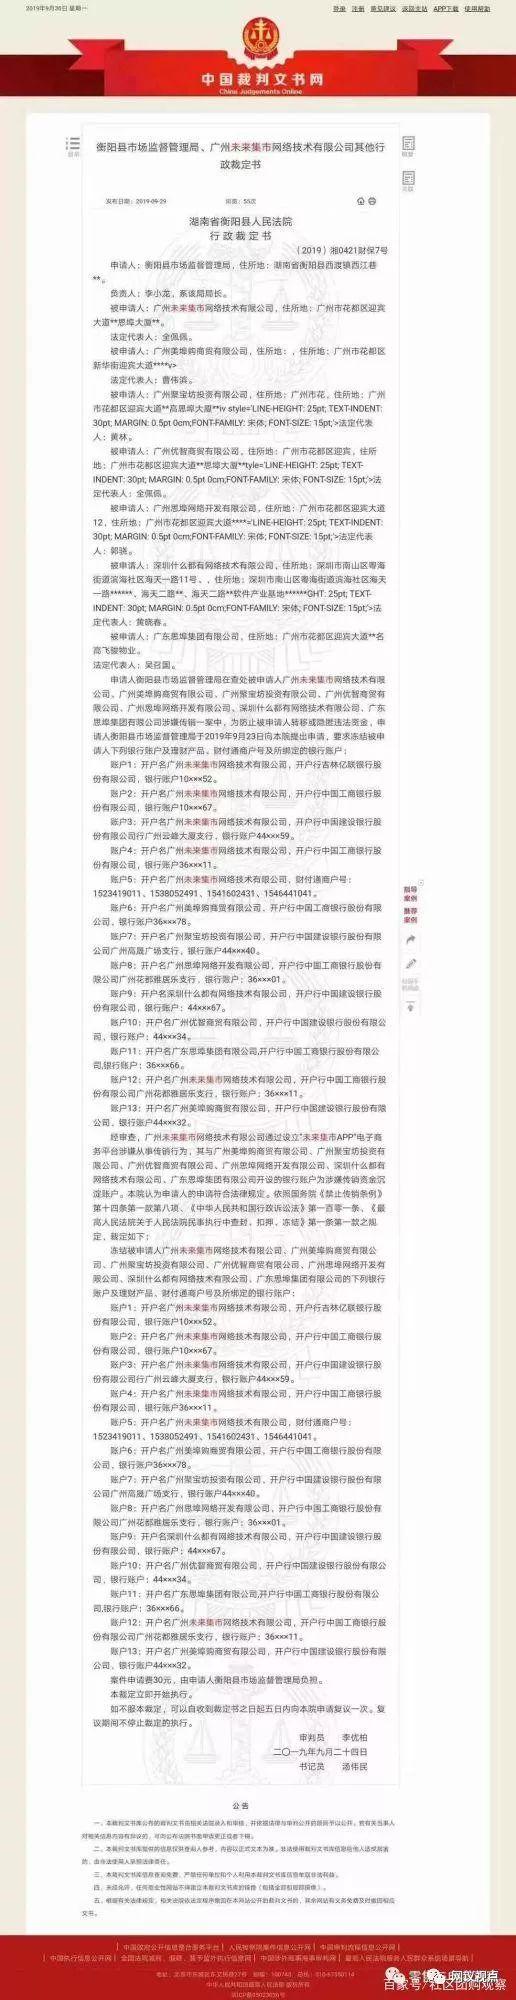 http://www.k2summit.cn/yulemingxing/1174857.html